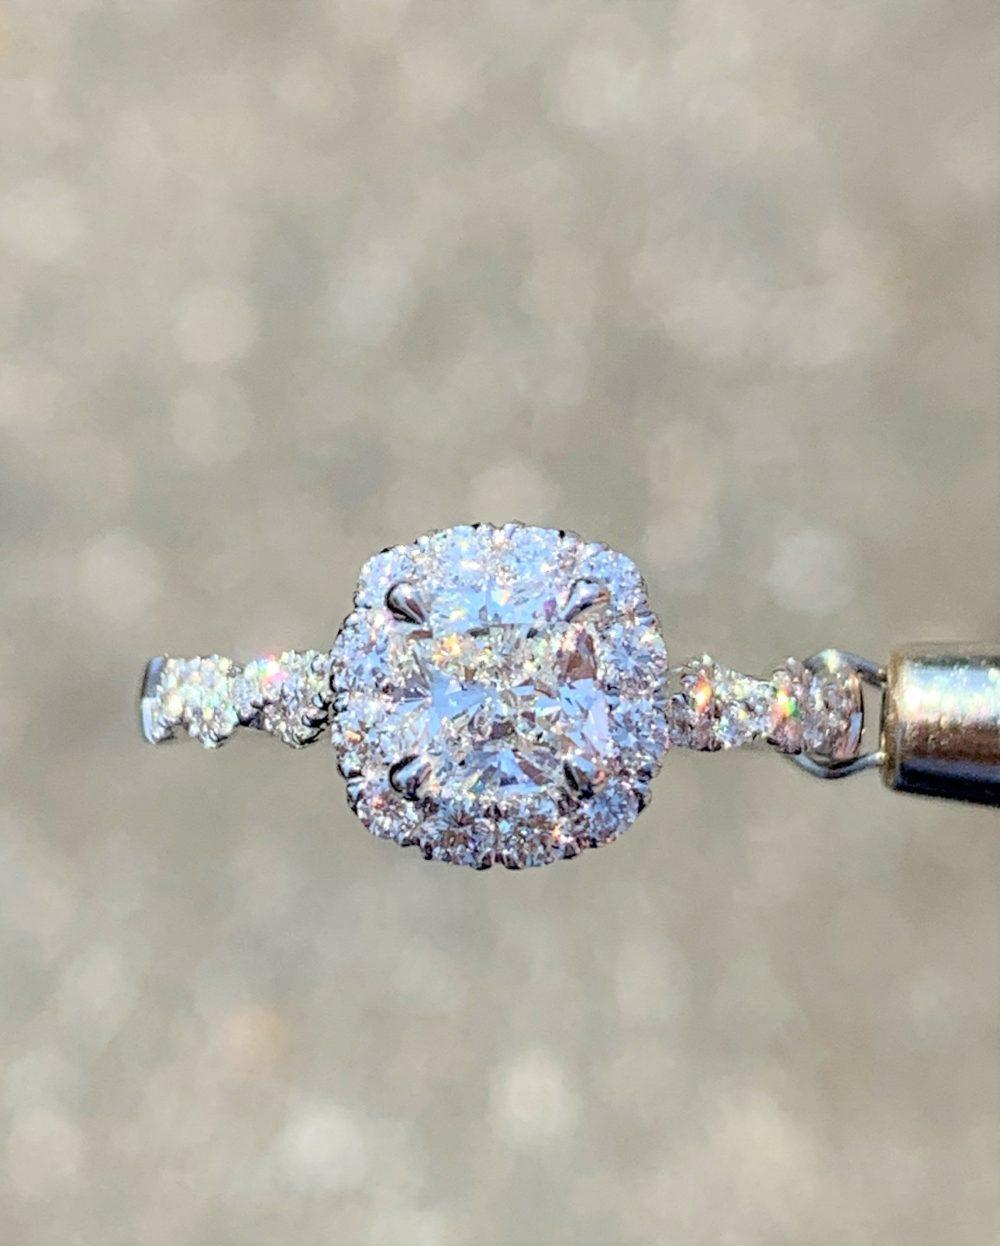 1.00Ct Diamond Cushion Cut Halo Criss Cross Infinity Twisted Engagement Ring Wedding Rings Bands Platinum 18K 14K White Yellow Rose Gold